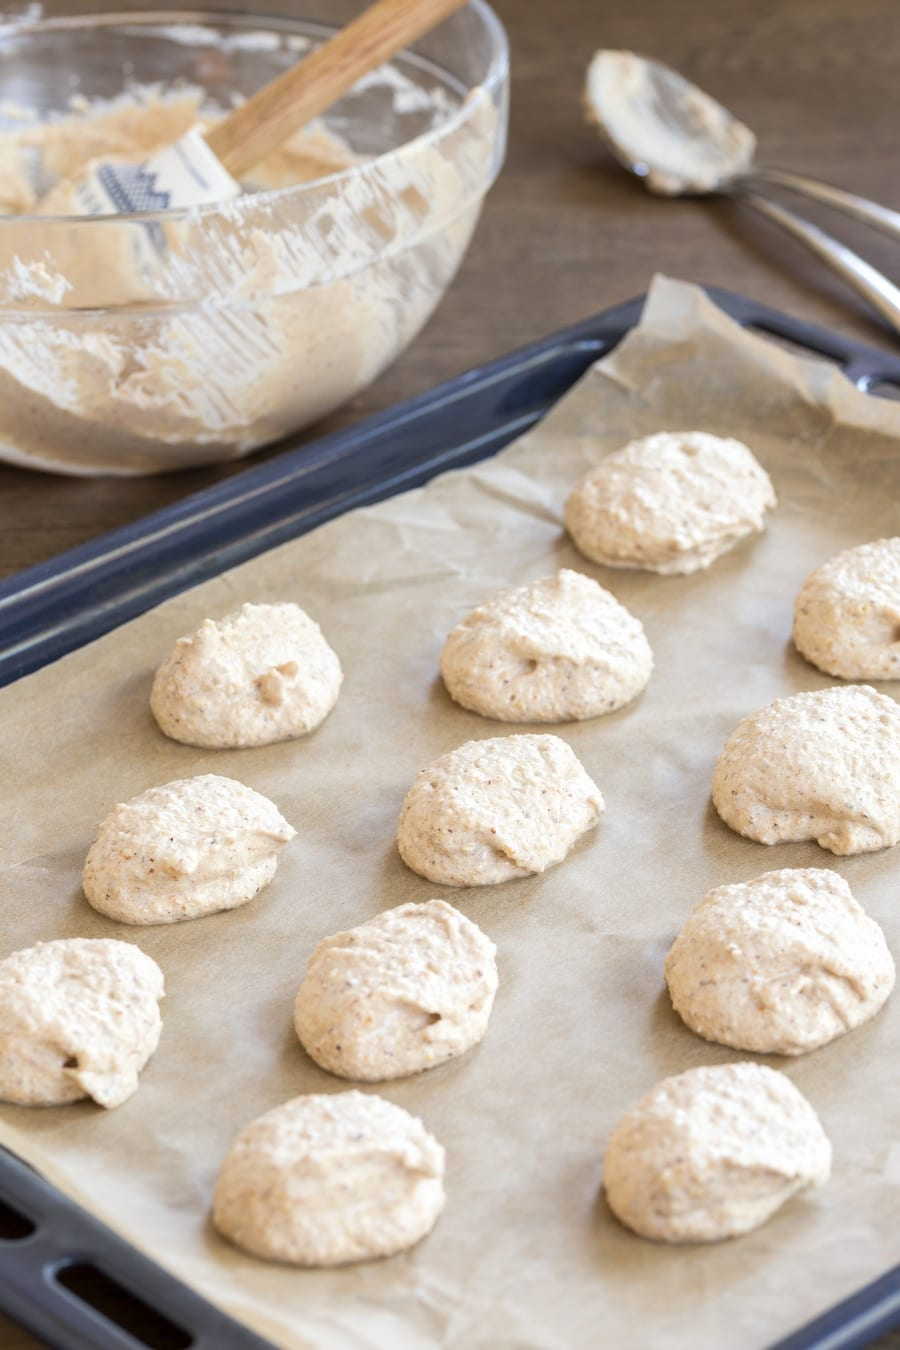 Honey hazelnut meringue, unbaked on sheet pan.